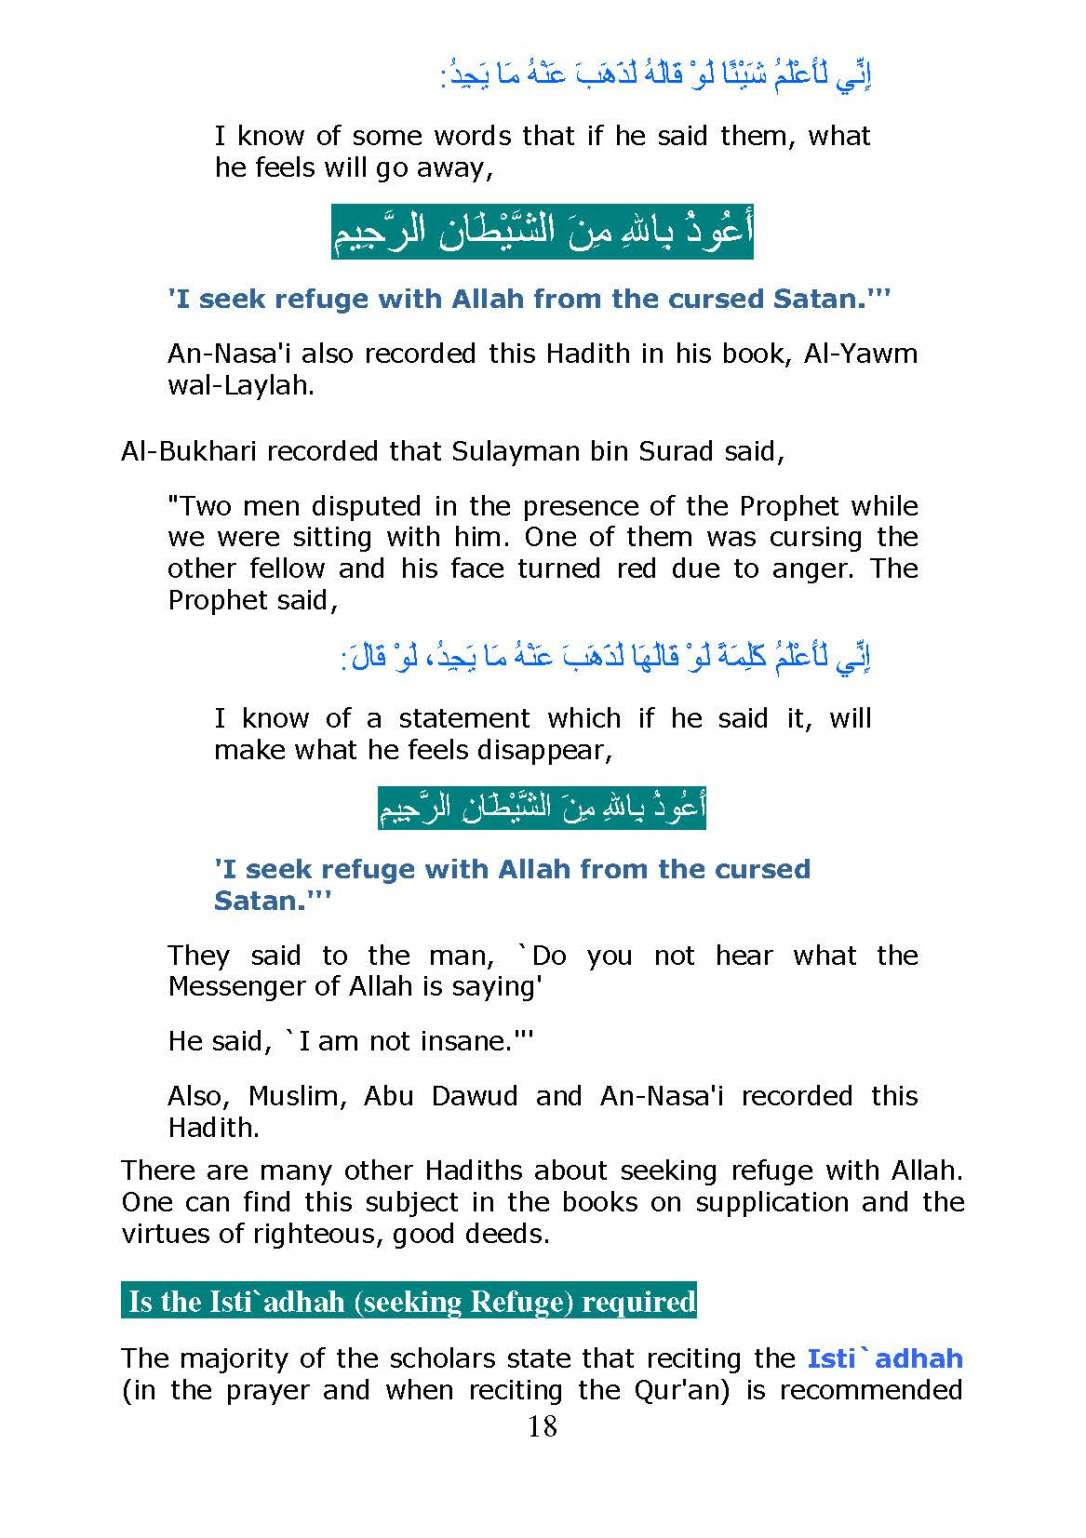 001Fateh_Page_18